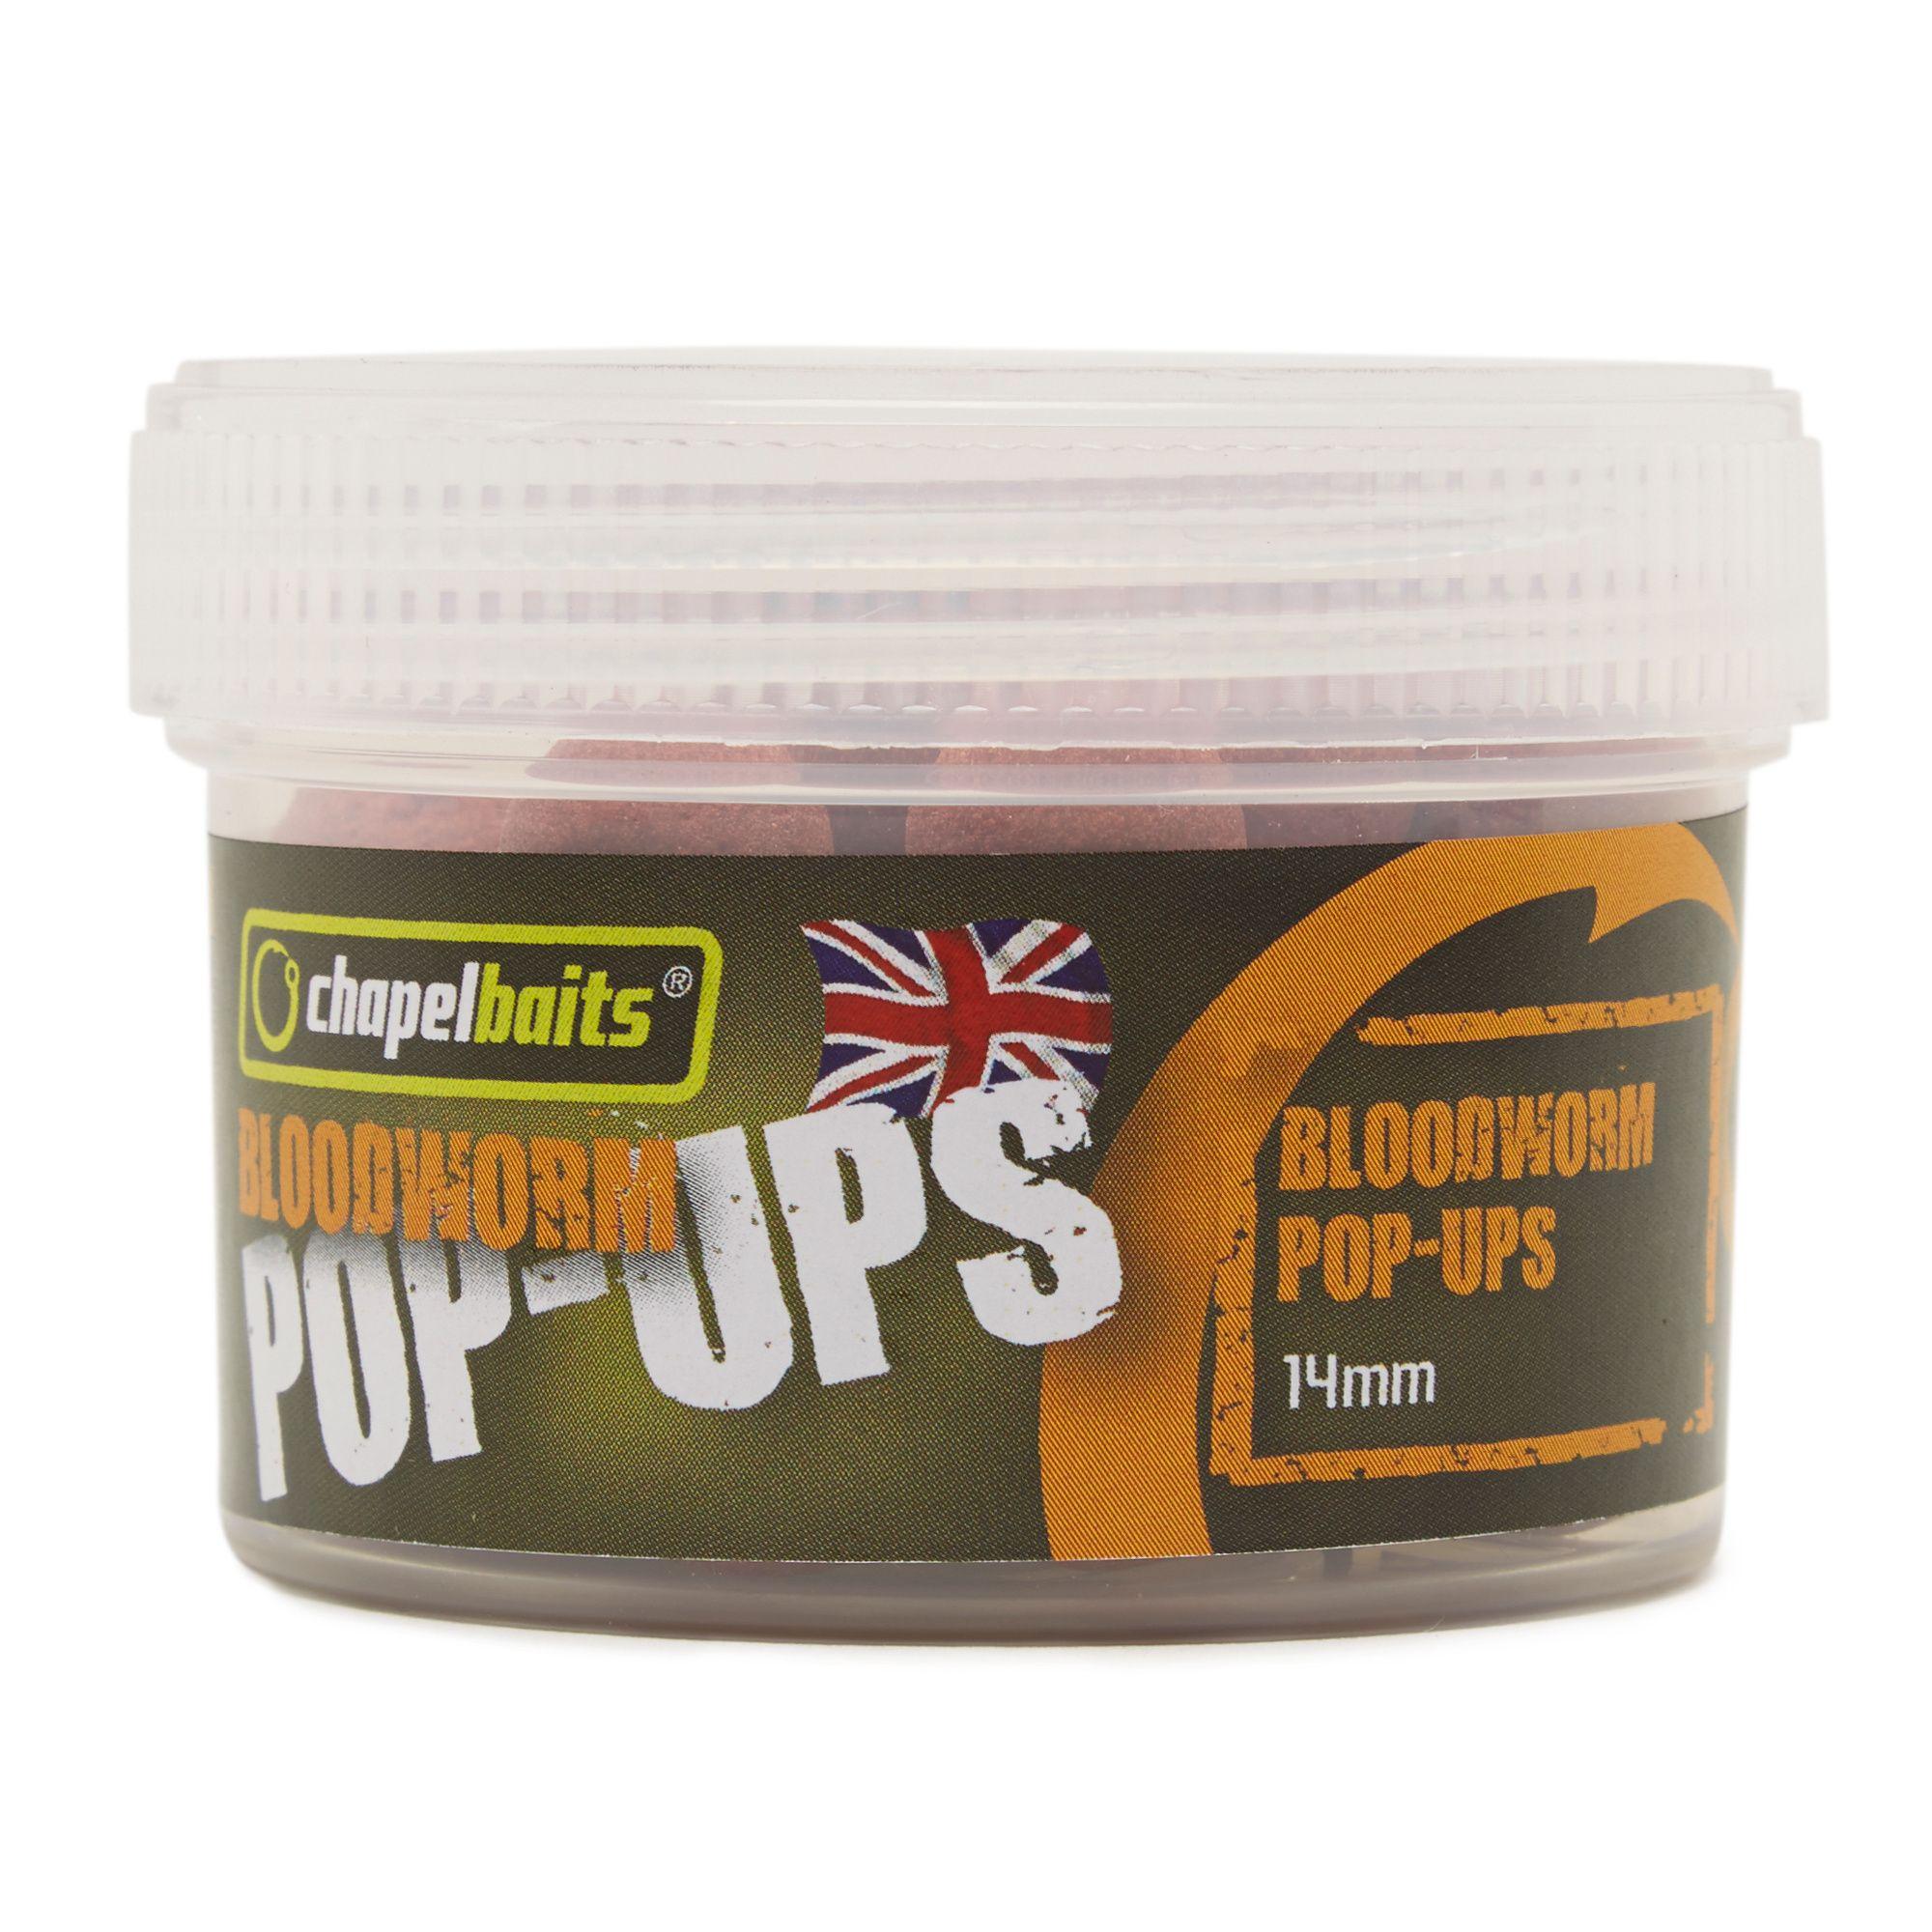 CHAPEL BAITS Bloodworm Pop-Ups Session Pack, 14mm